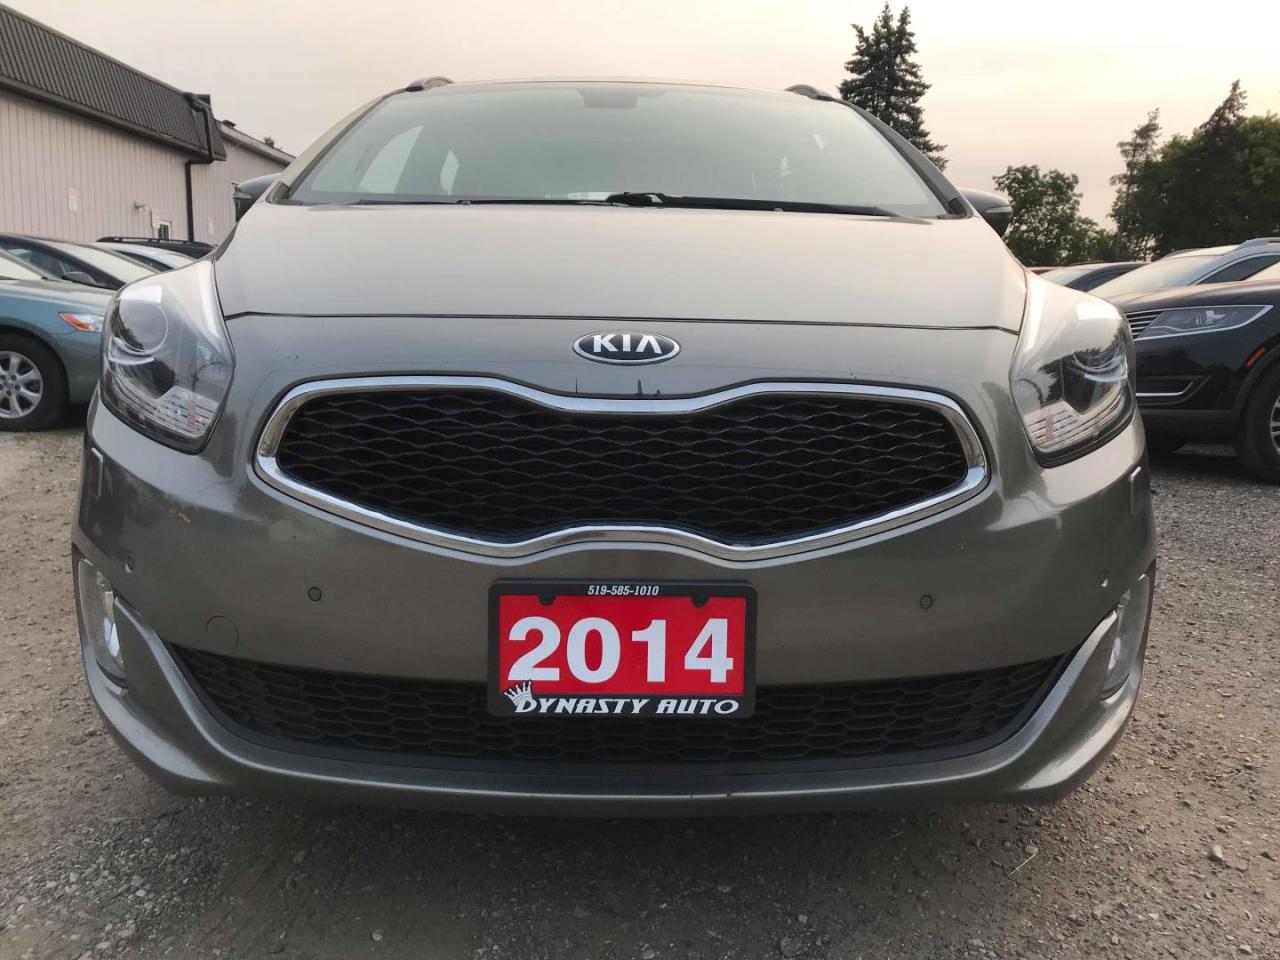 2014 Kia Rondo